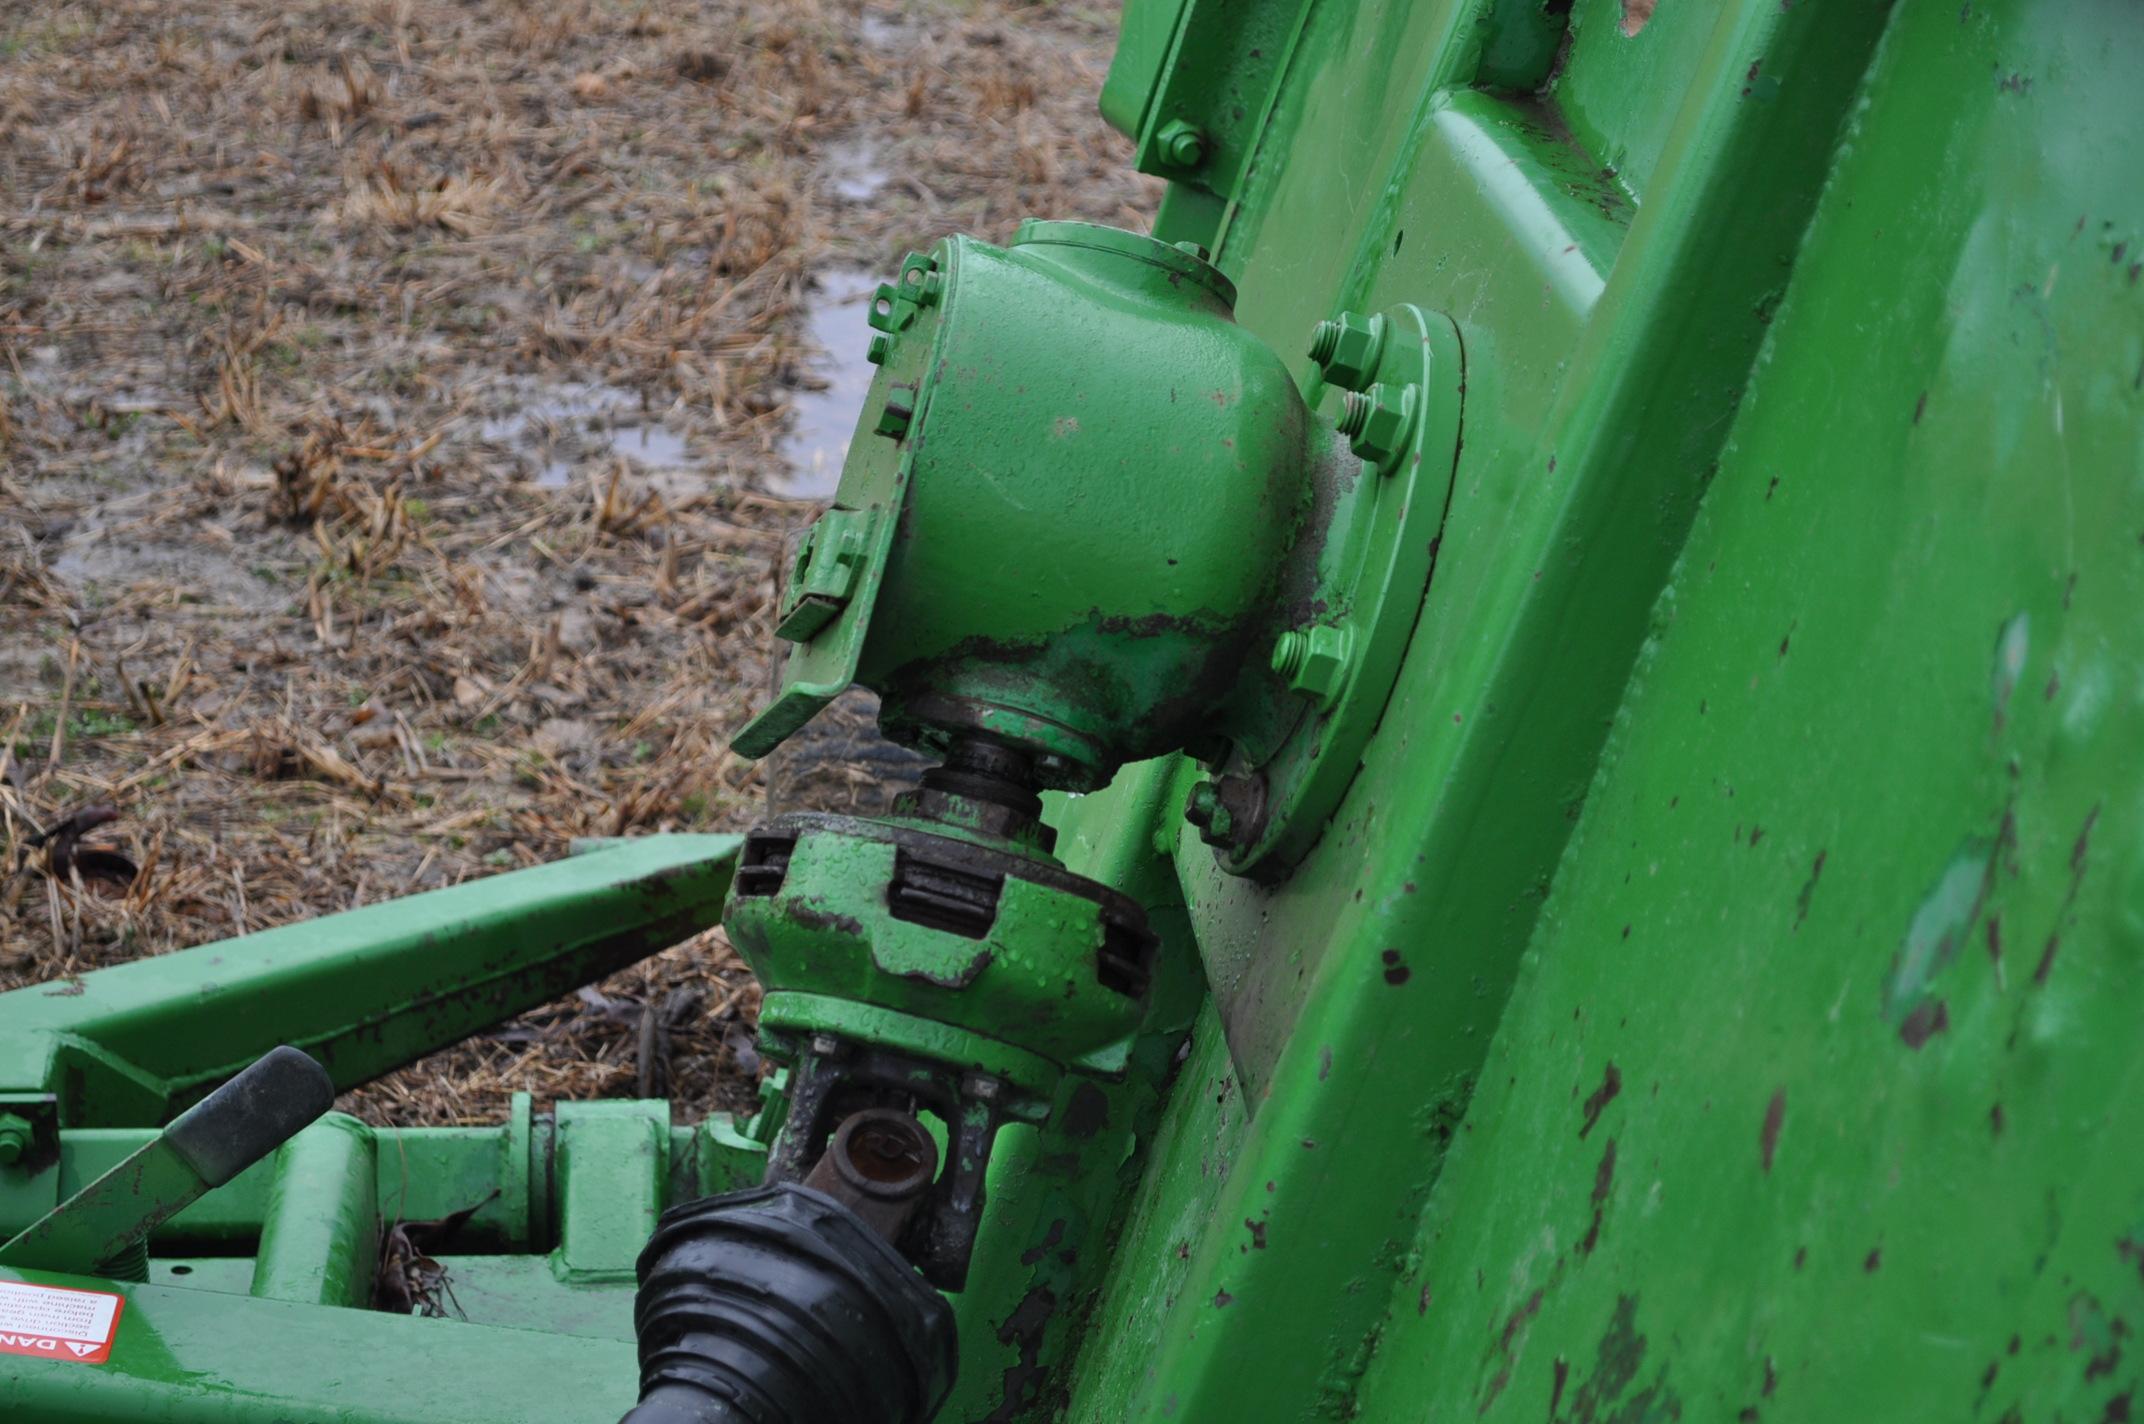 15' John Deere 1508 rotary mower, hyd fold, 1000 pto - Image 9 of 13